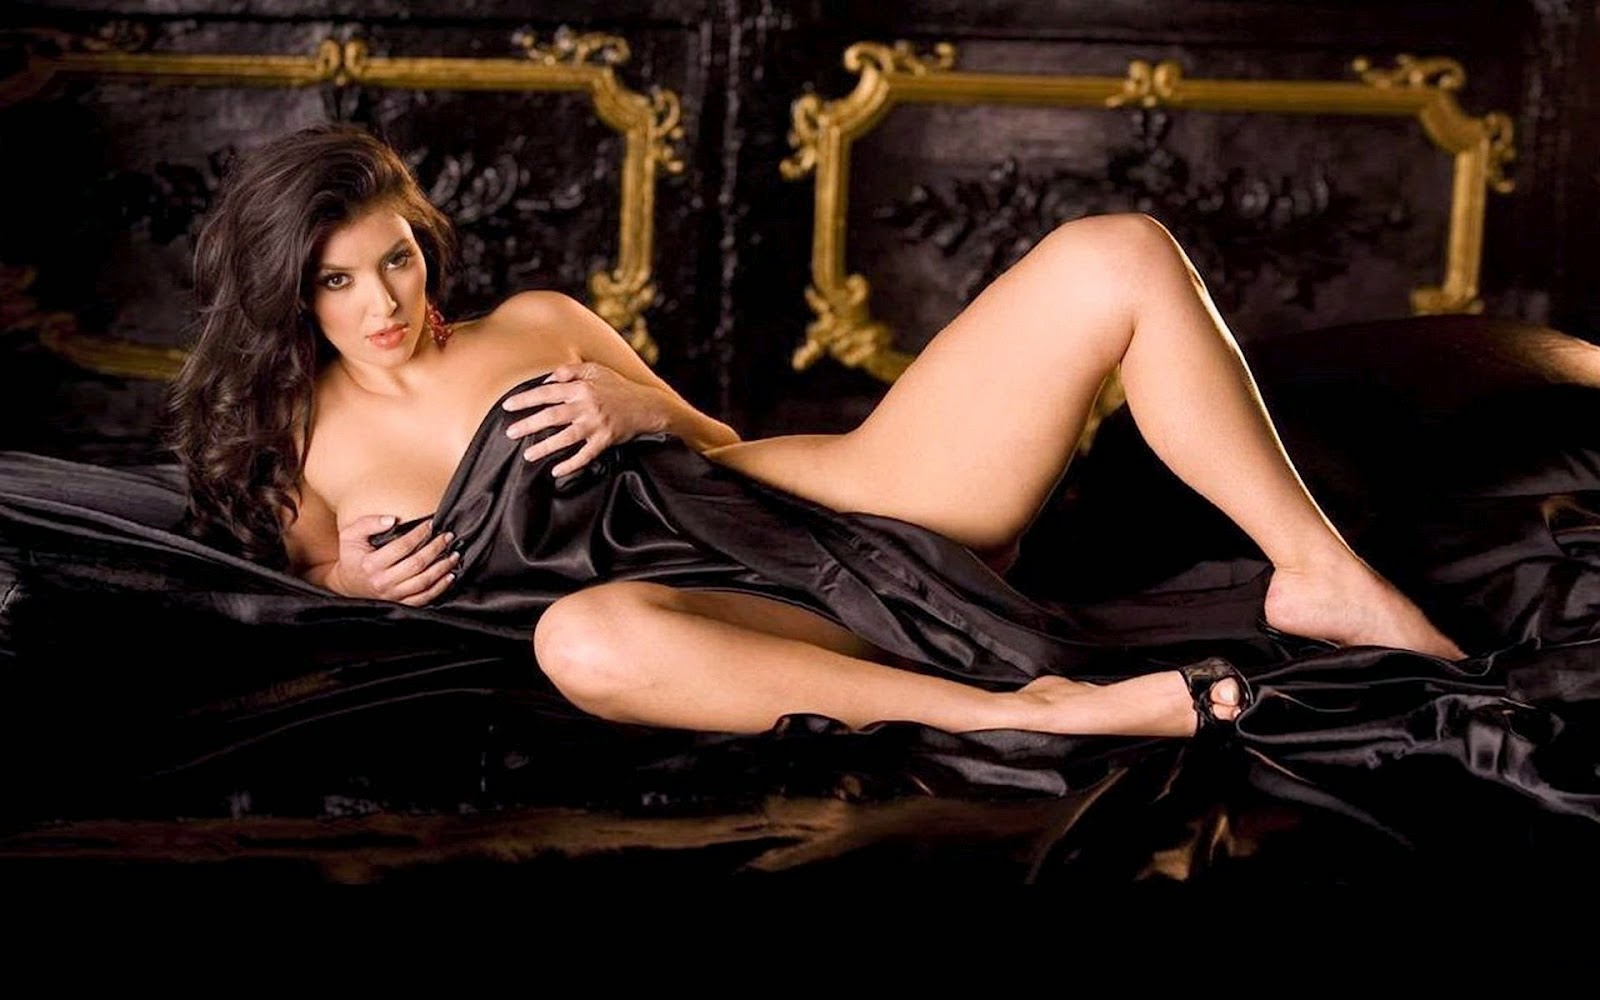 from Elliott kimberly j brown hot nude